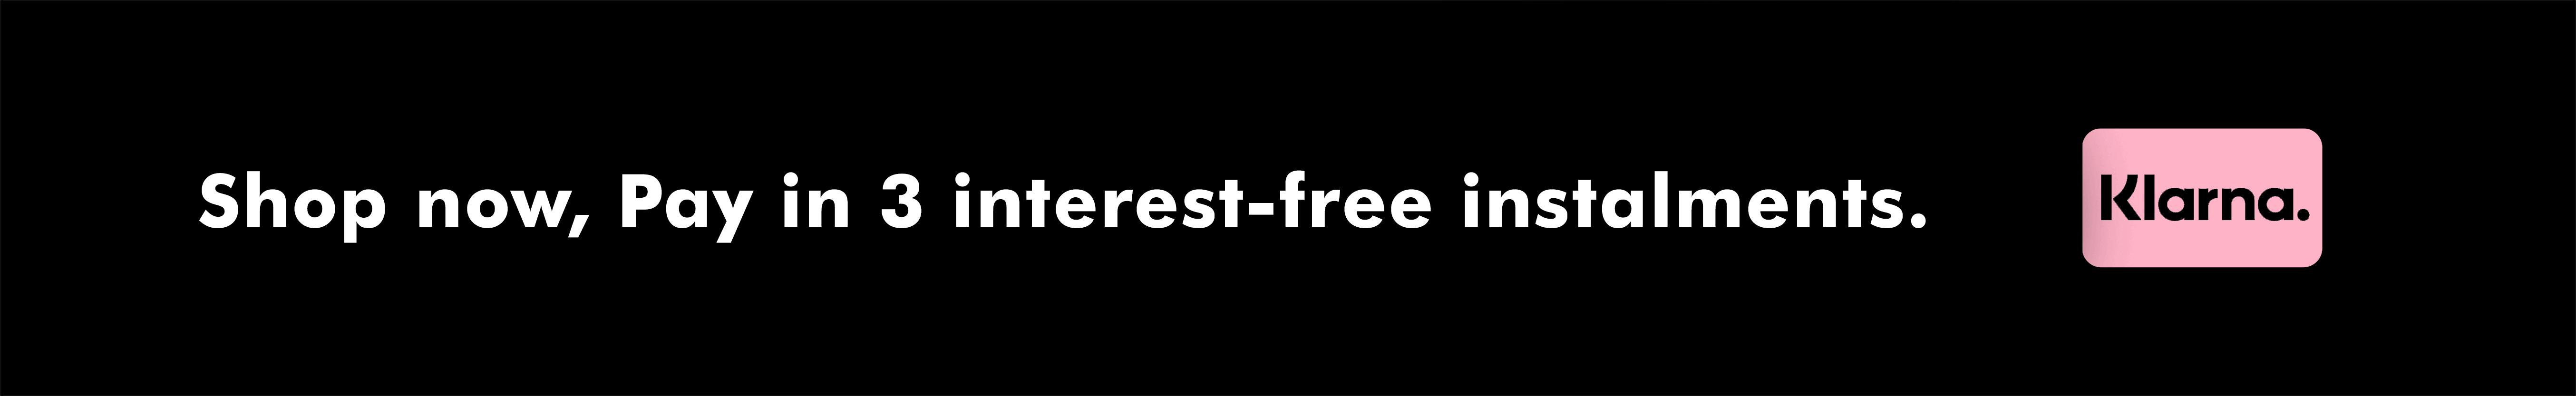 Klarna - Pay in 3 interest free instalments